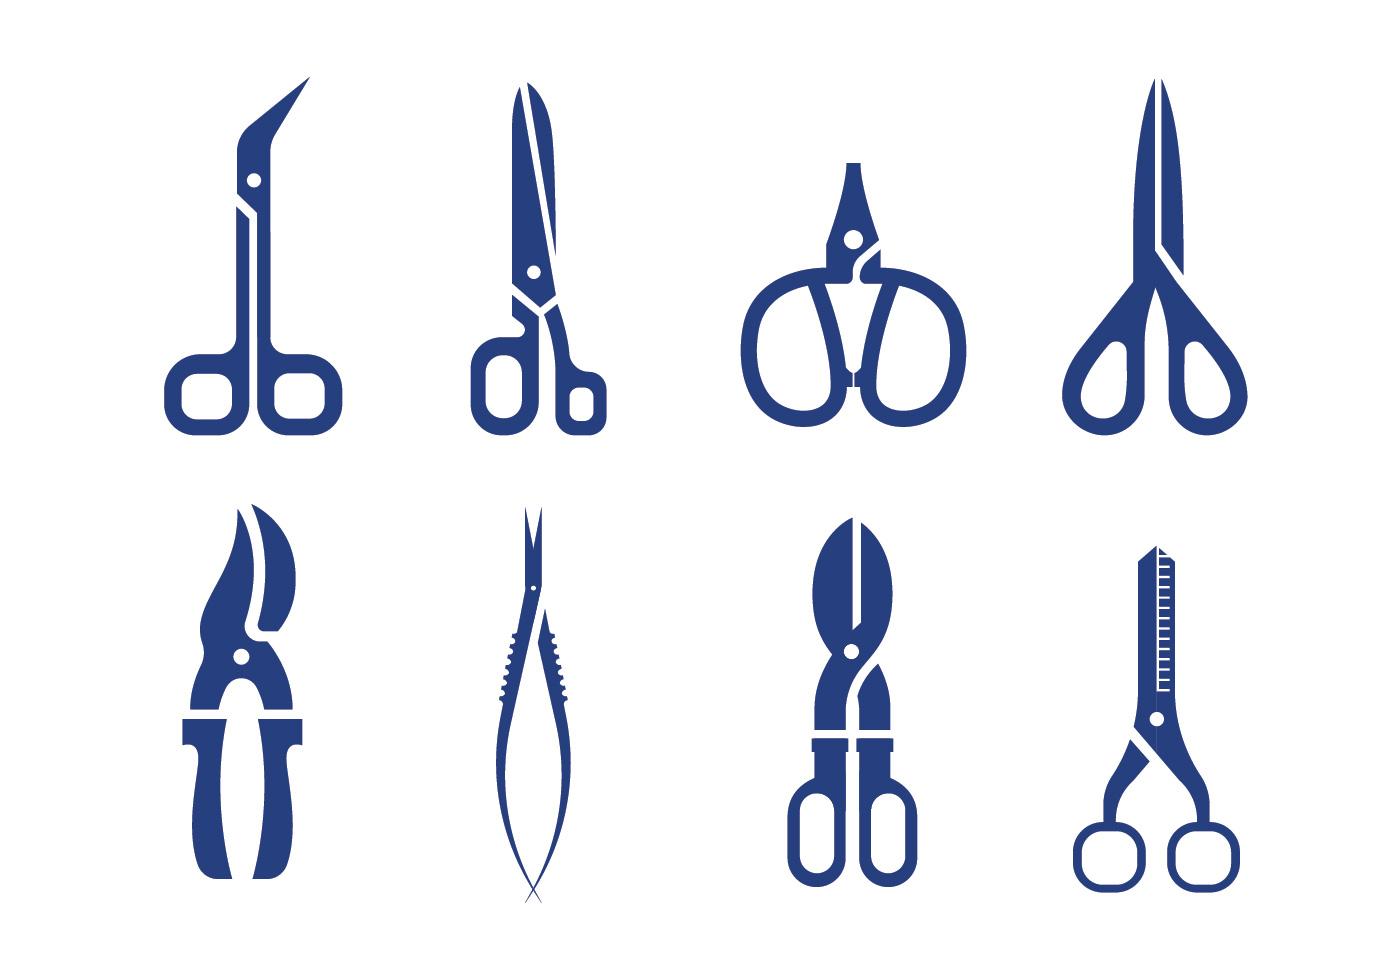 1400x980 Scissors Hair Free Vector Art